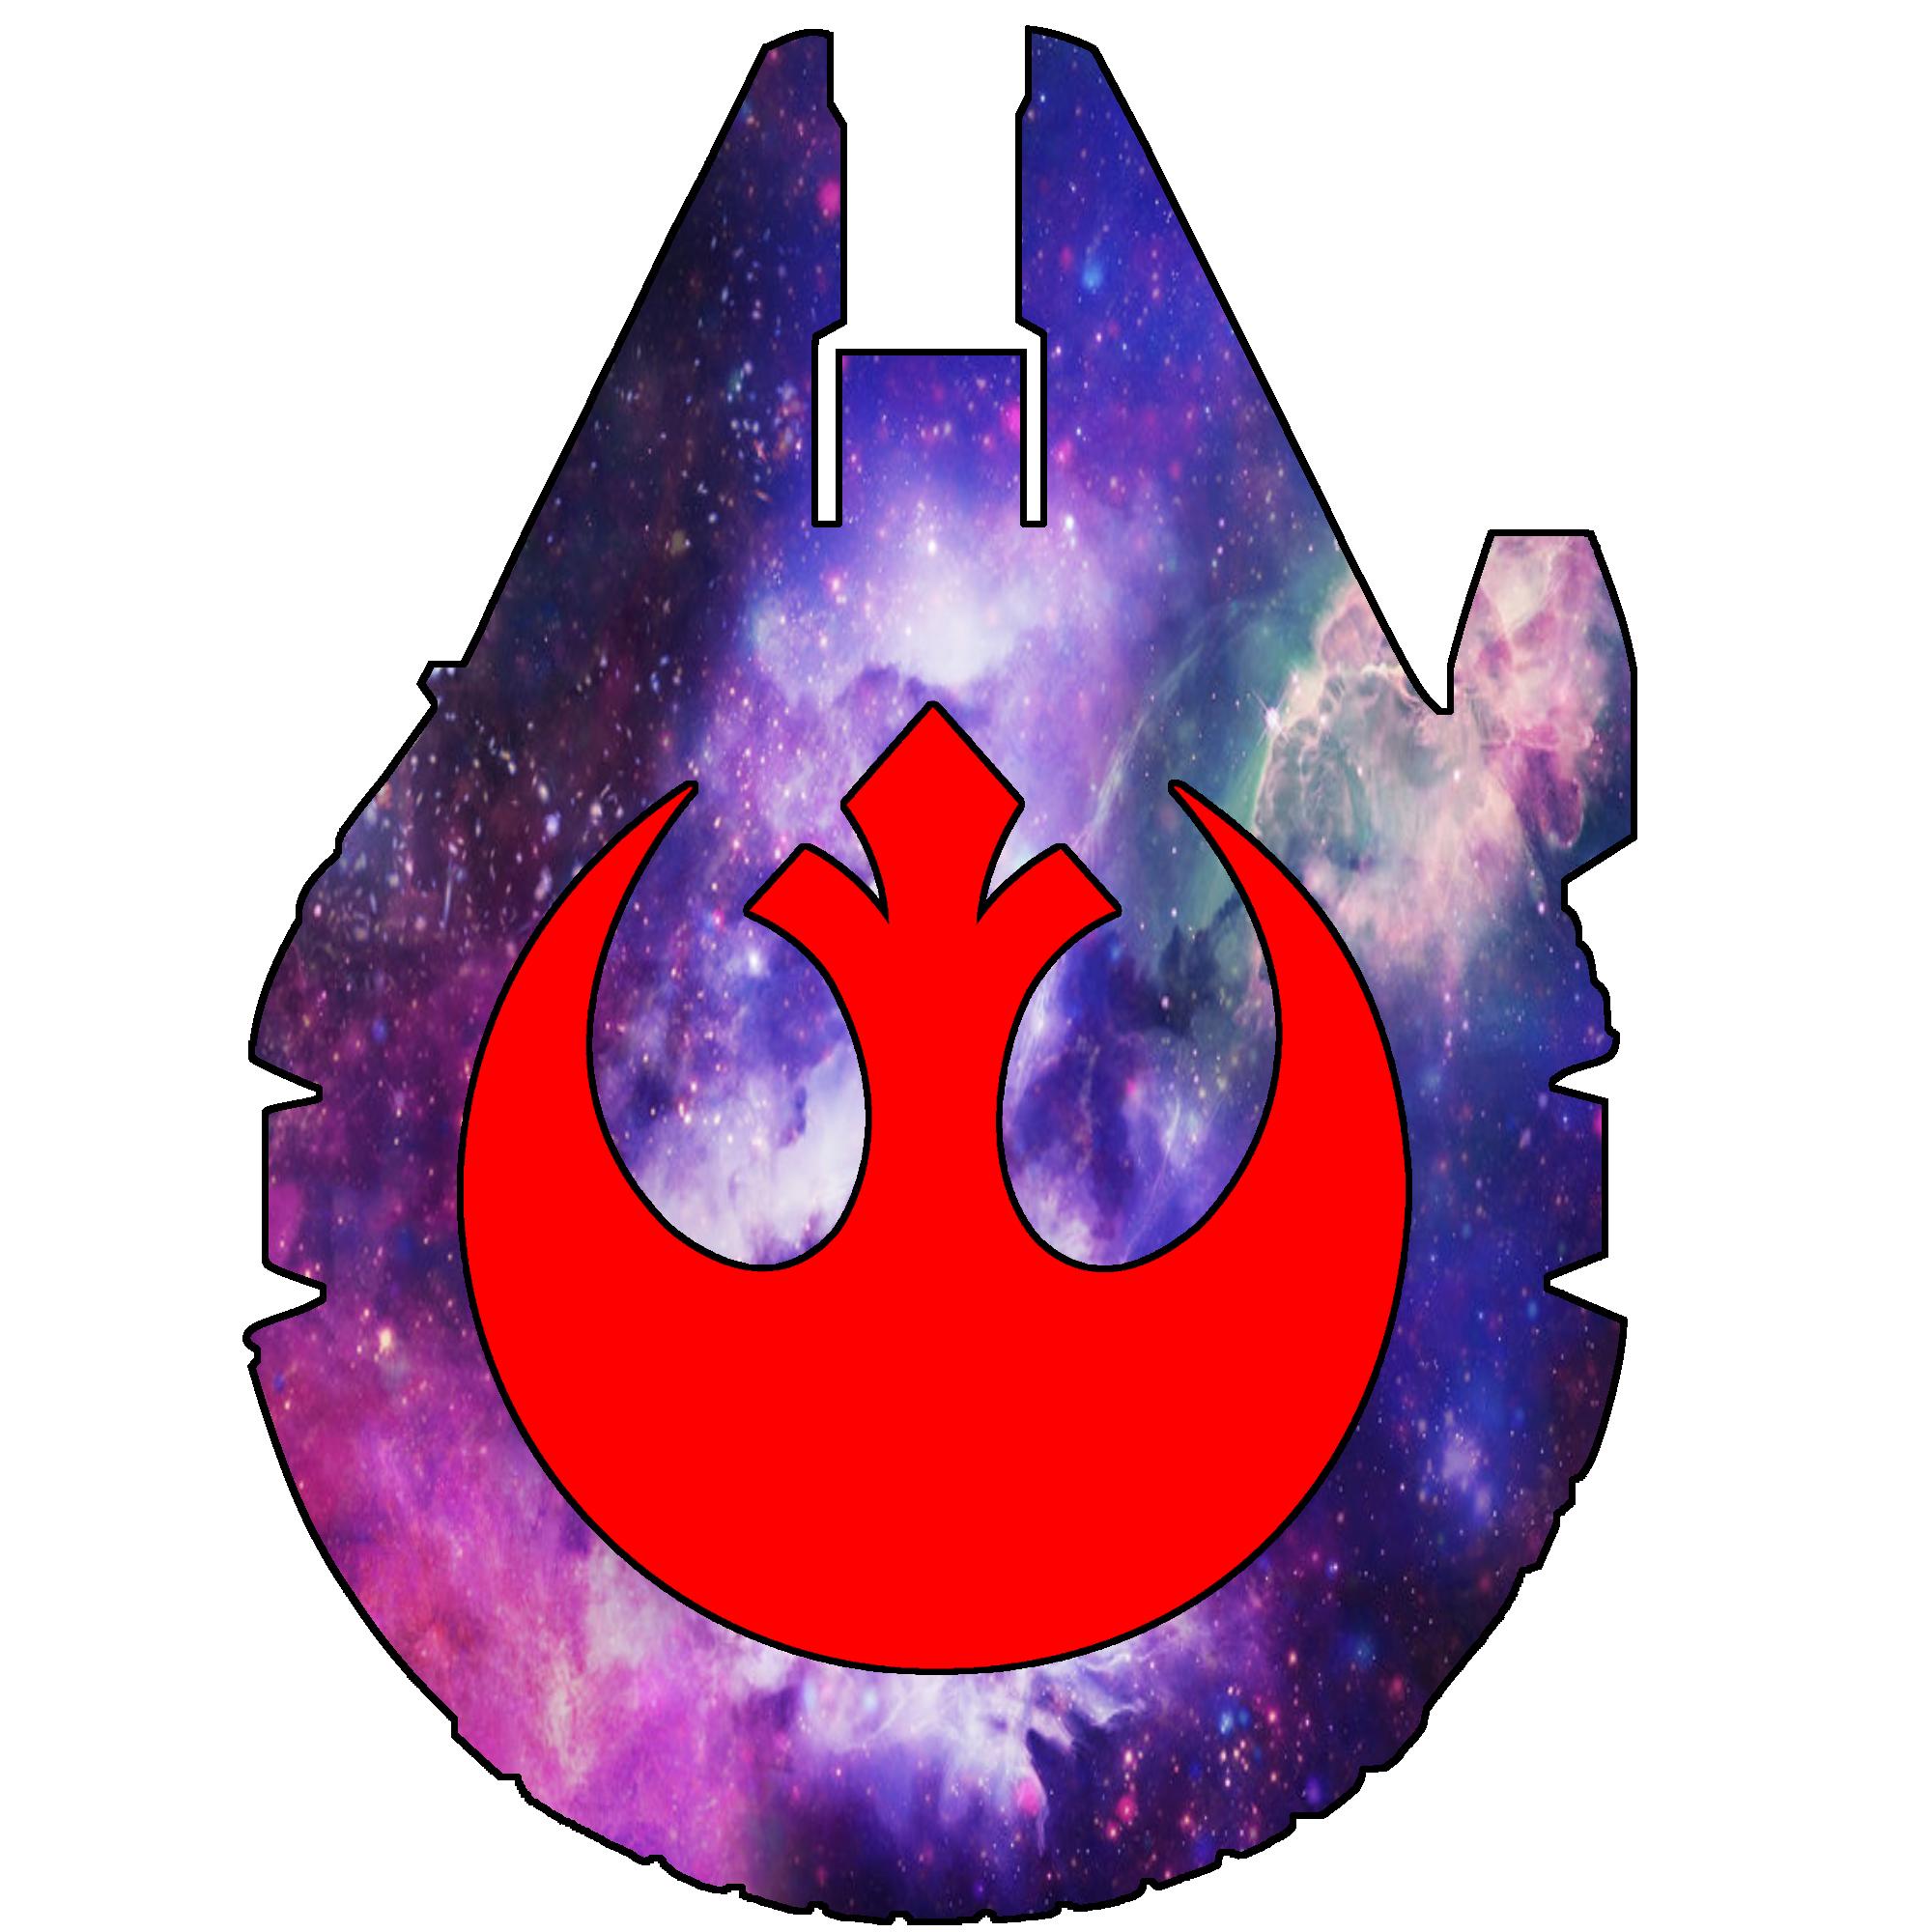 Millennium Falcon - Rebel Galaxy Tattoo Idea